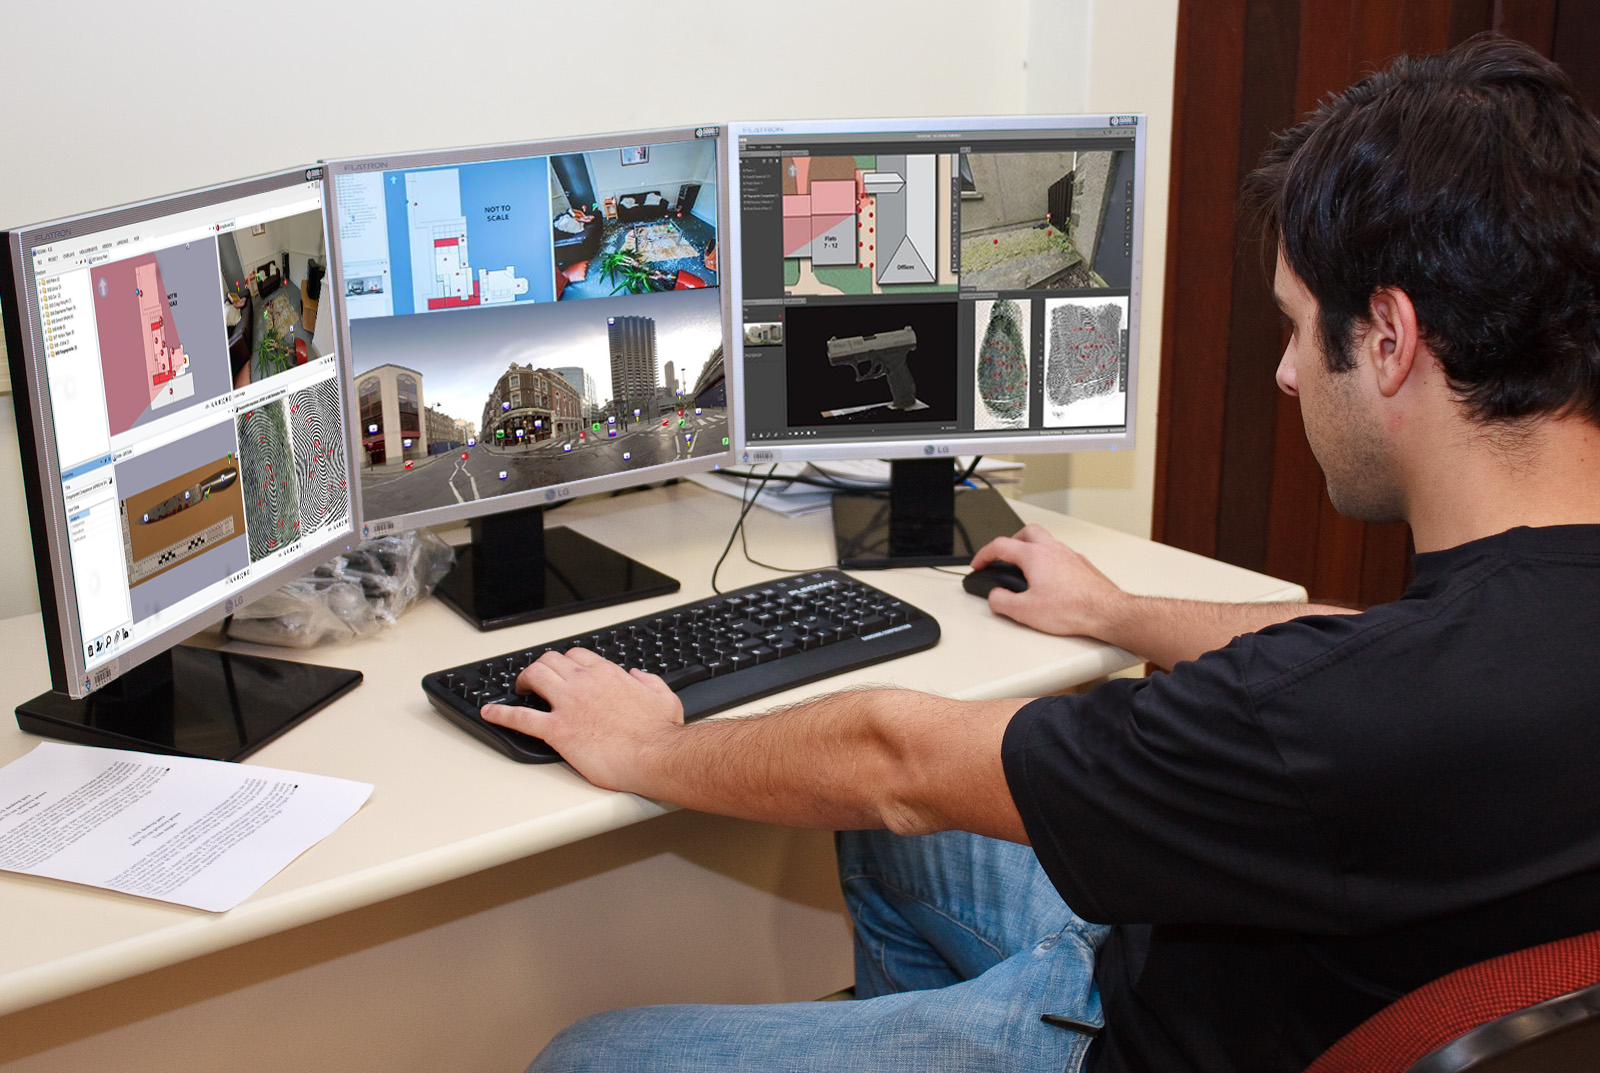 R2S screens photoshopped onto image